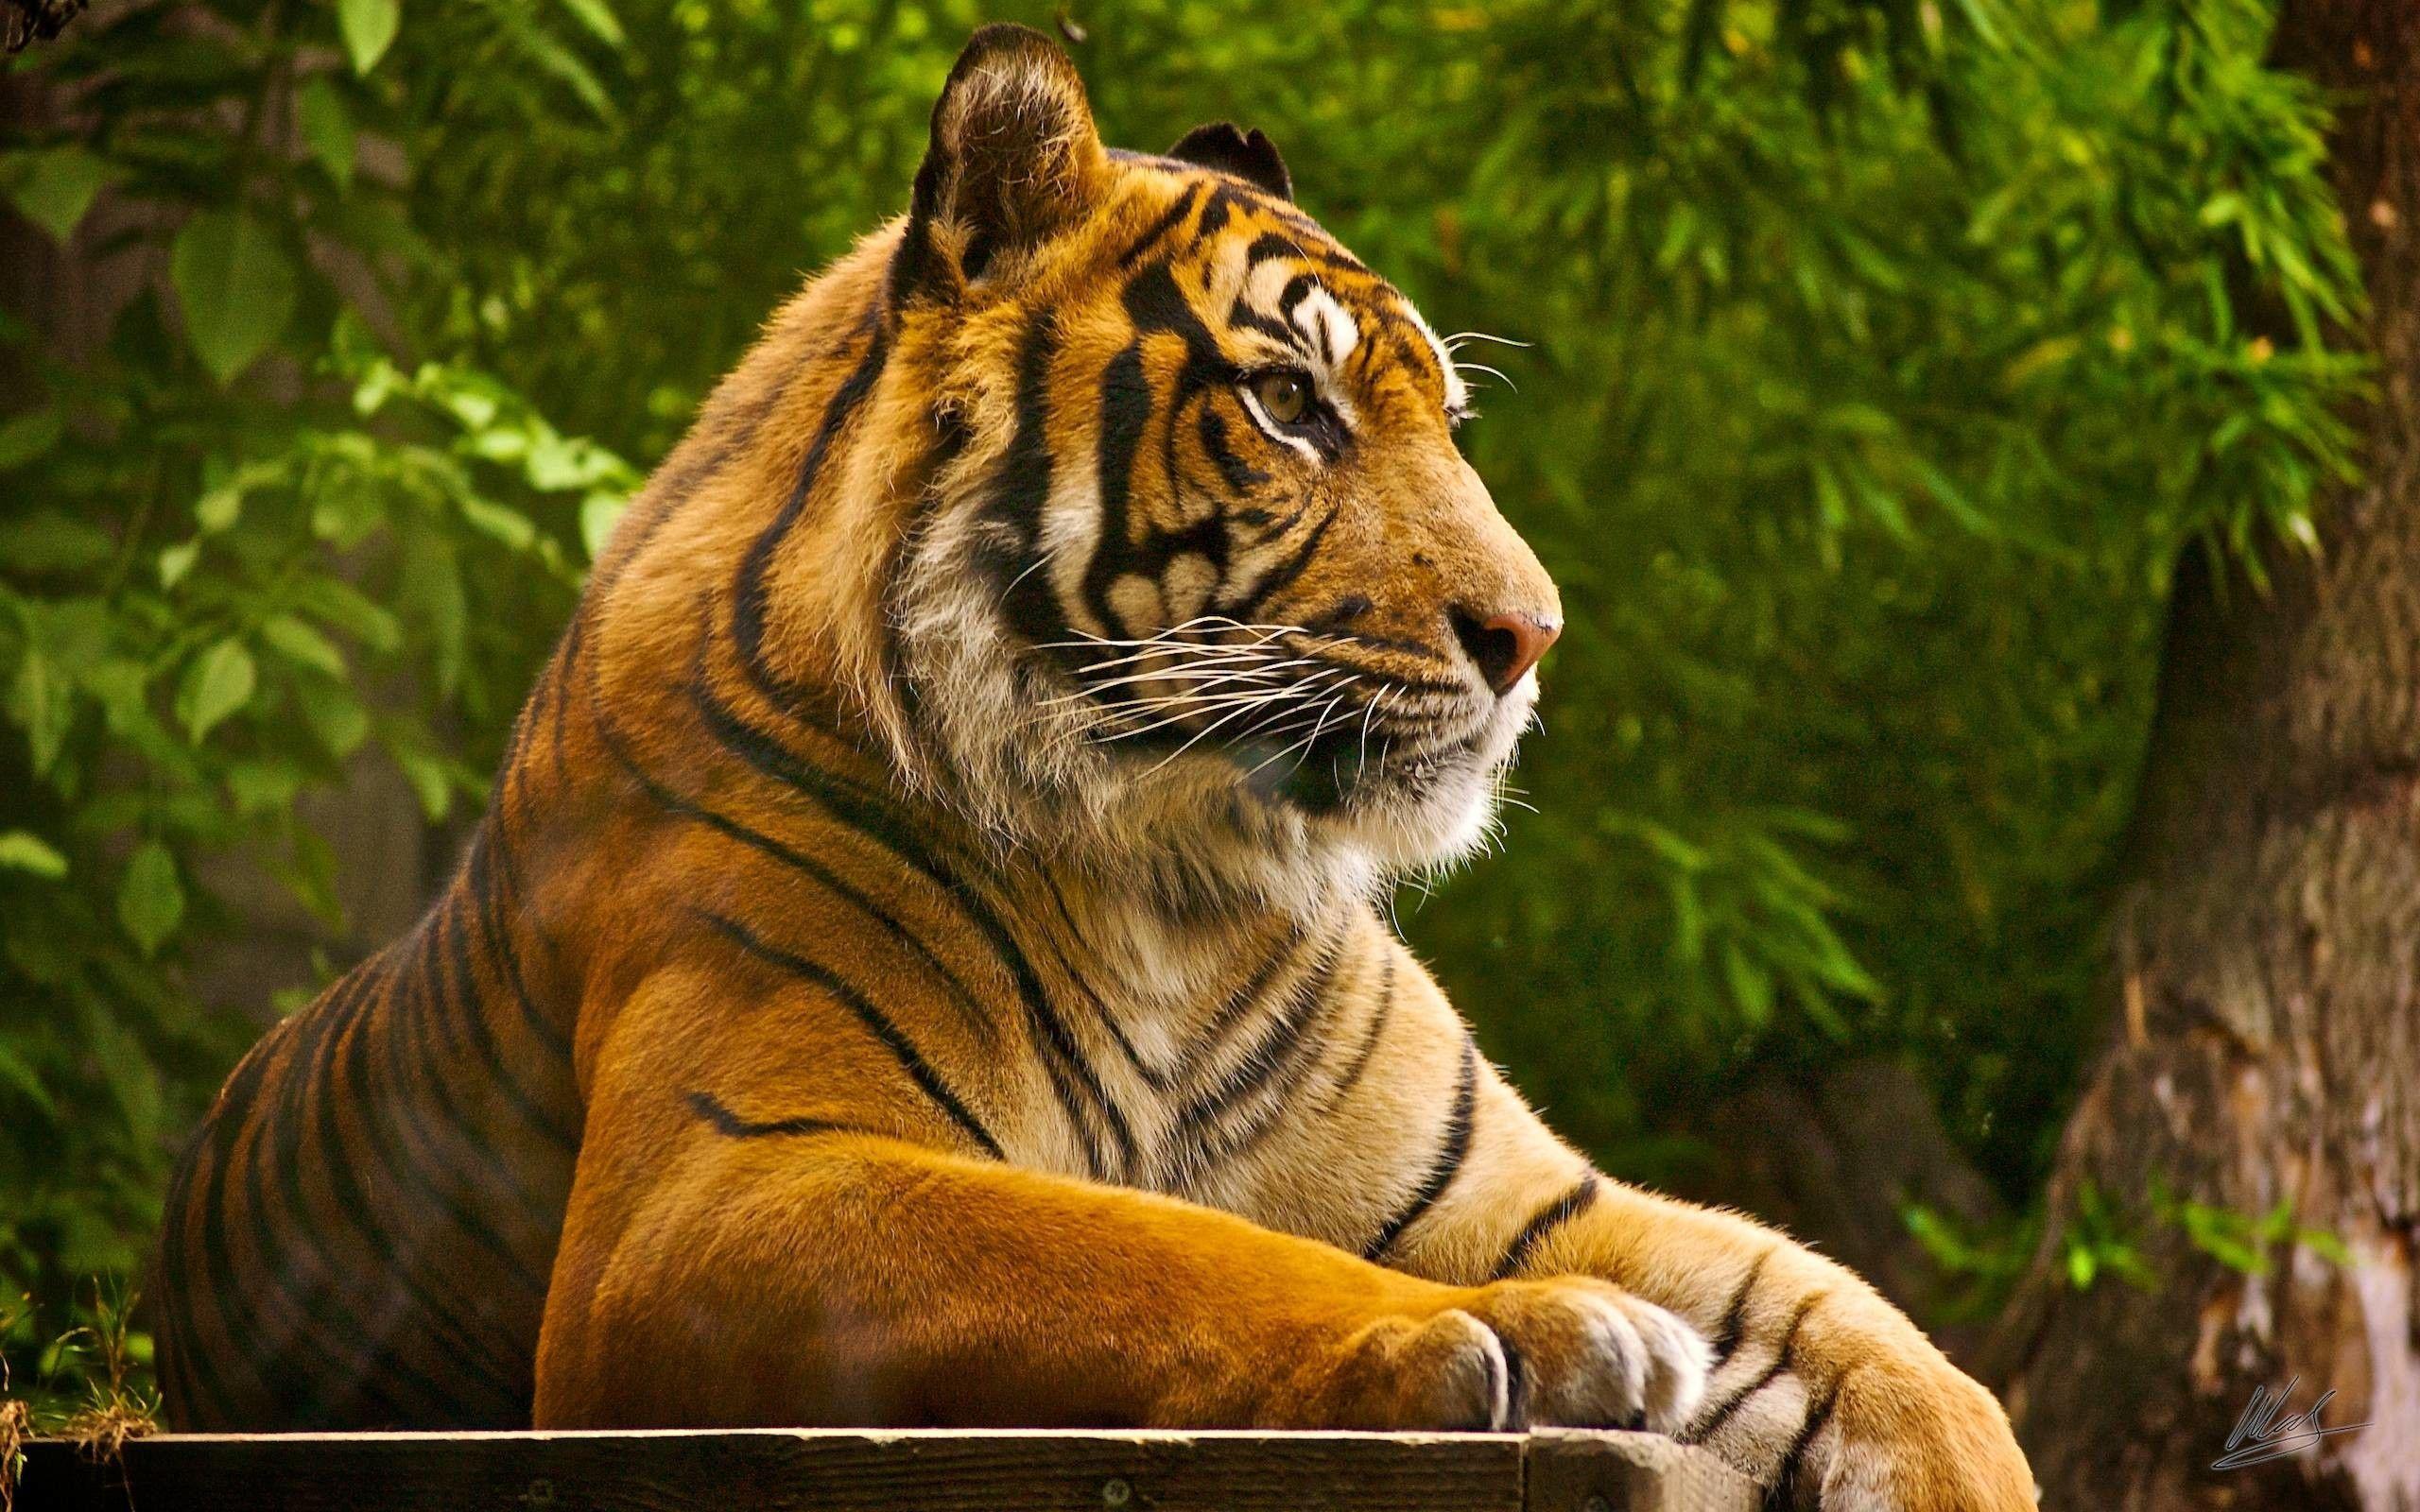 Tiger Desktop Wallpapers   Top Tiger Desktop Backgrounds 2560x1600